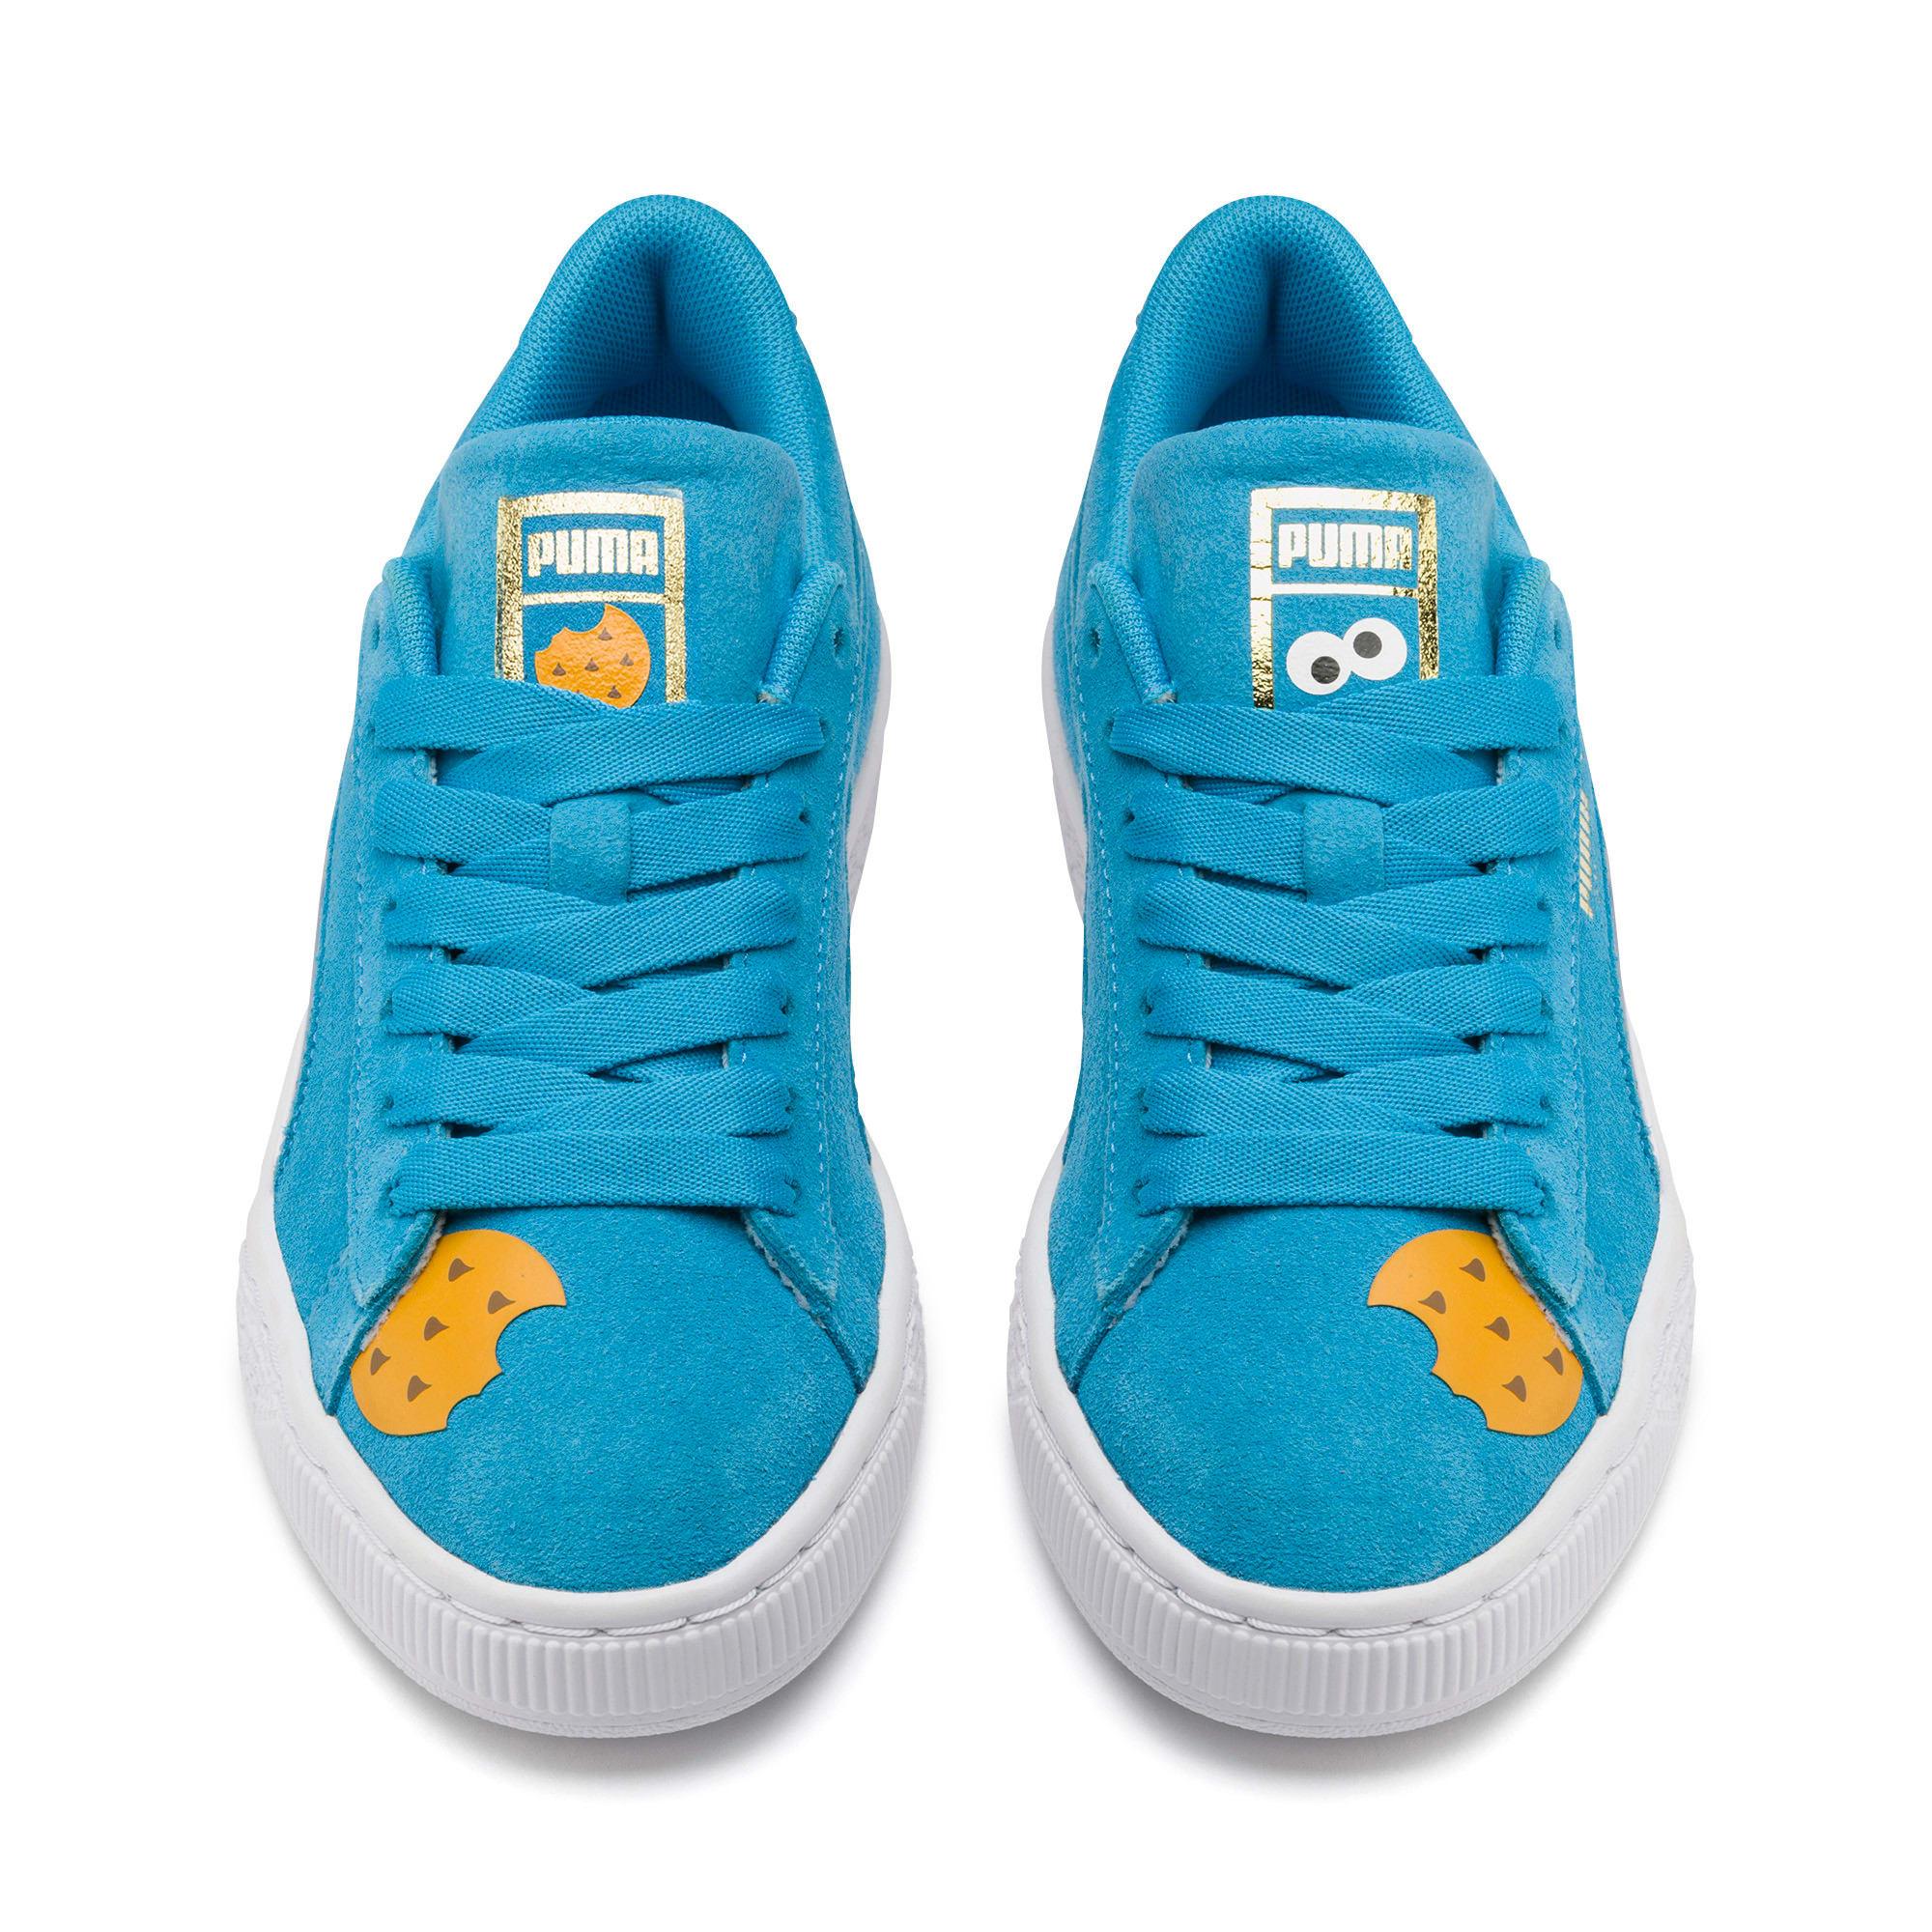 Thumbnail 7 of PUMA x SESAME STREET 50 Suede Statement Sneakers JR, Bleu Azur-Puma White, medium